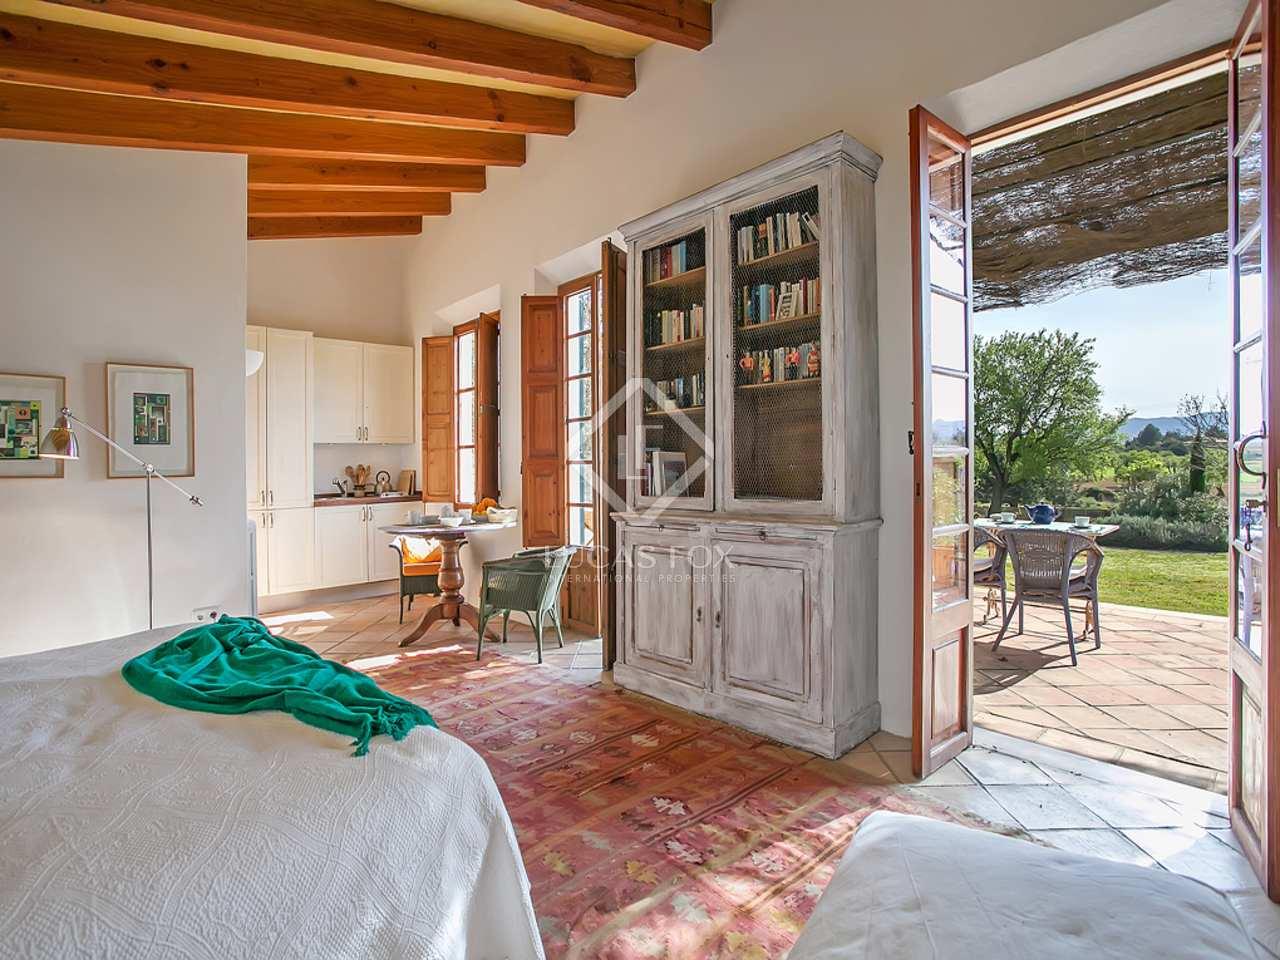 landhaus zum verkauf in establiments mallorca nahe palma. Black Bedroom Furniture Sets. Home Design Ideas